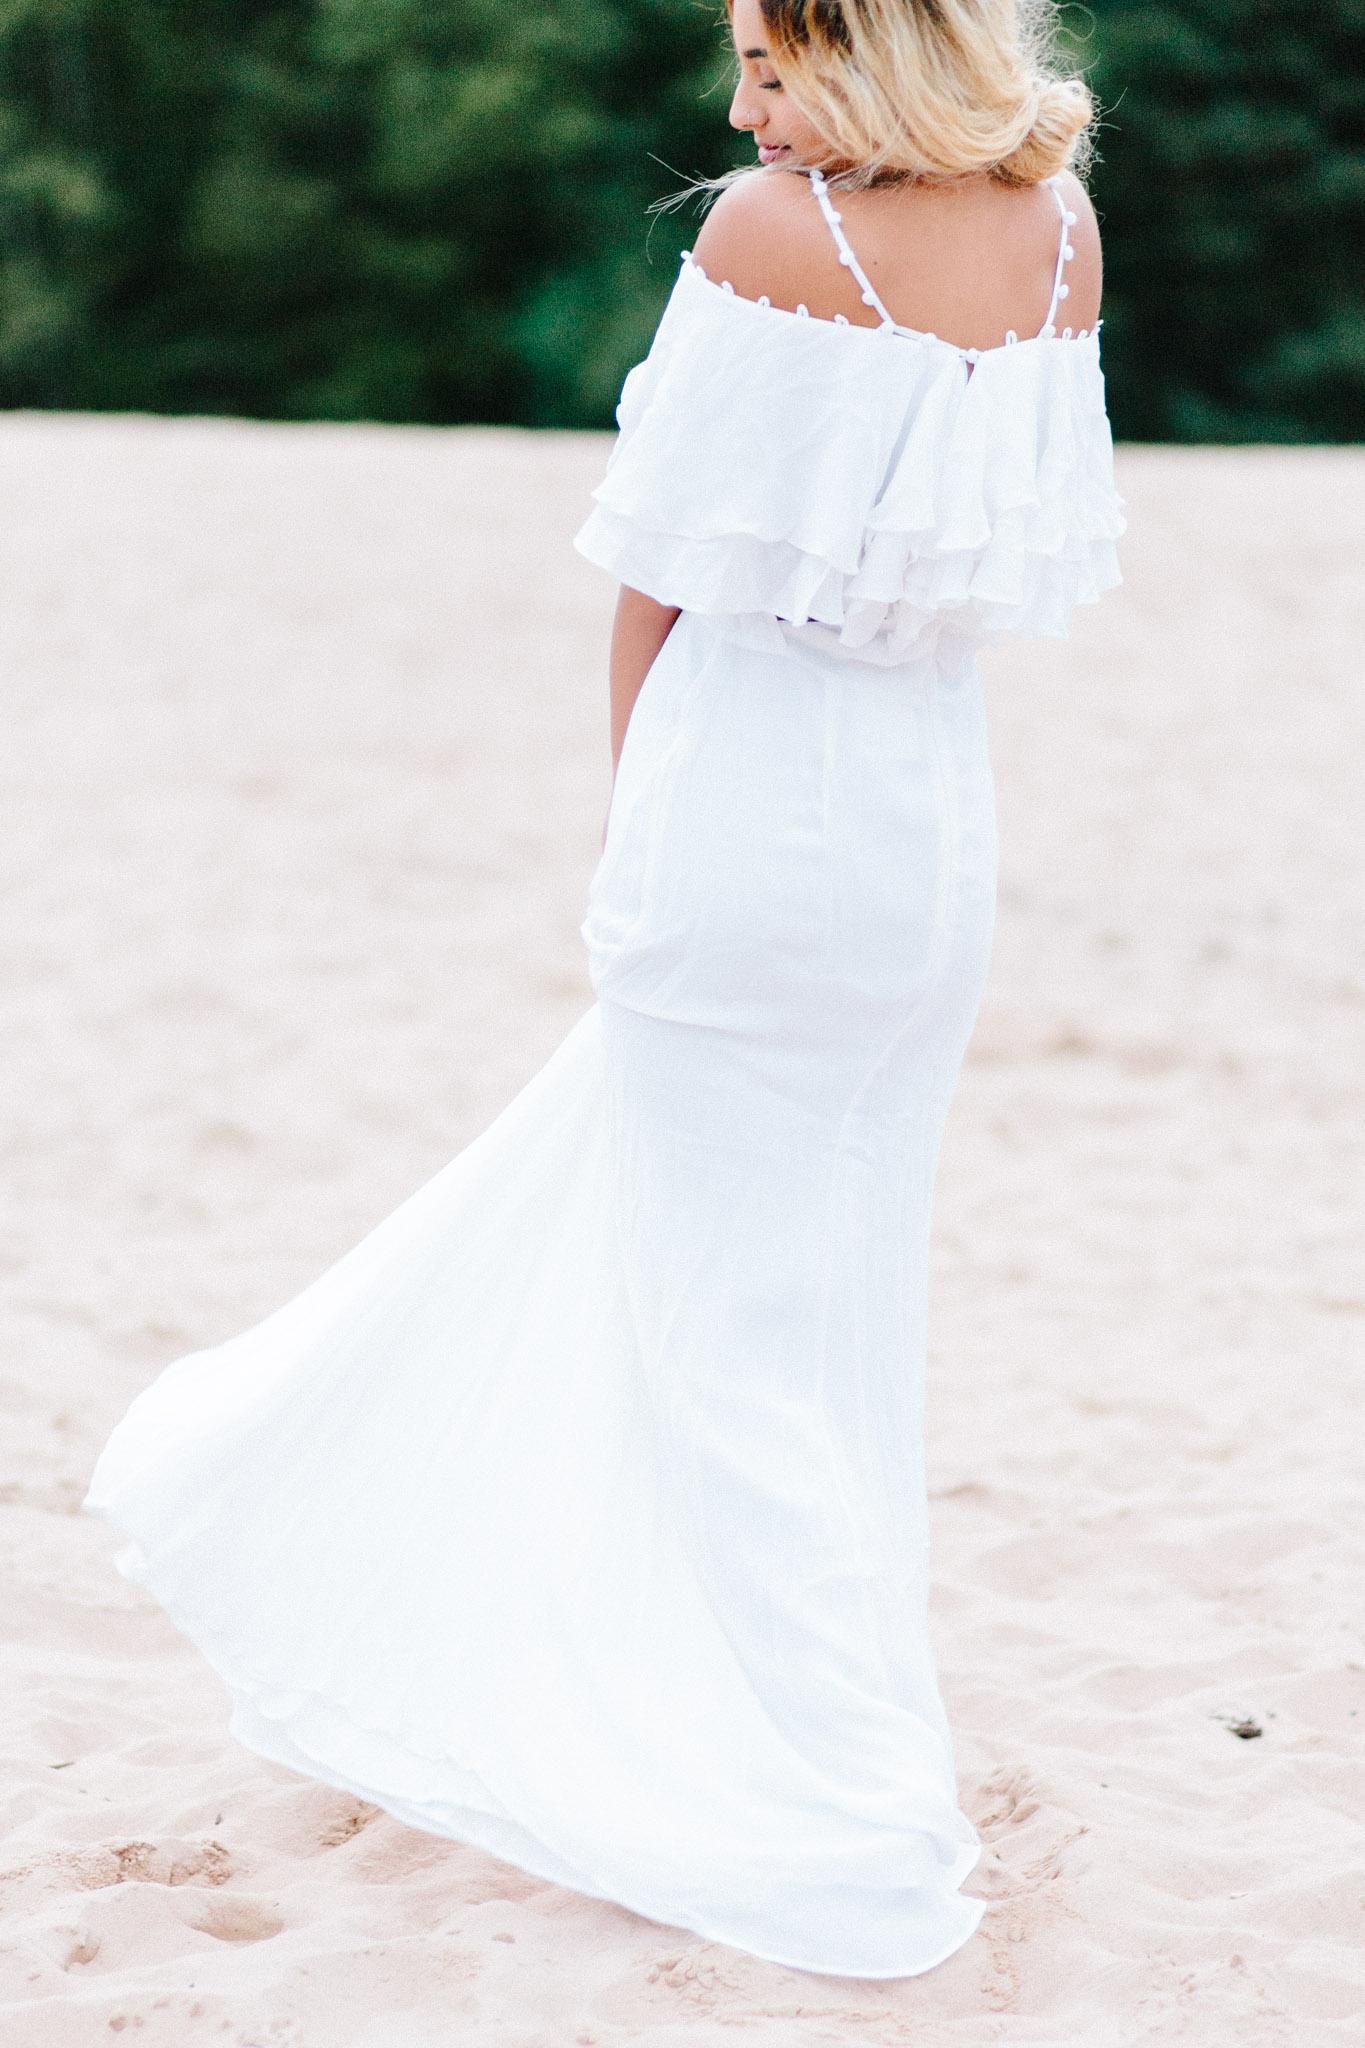 Speyer-Moroccan-Wedding-Inspiration-Pia-Anna-Christian-Wedding-Photography-S-64.jpg